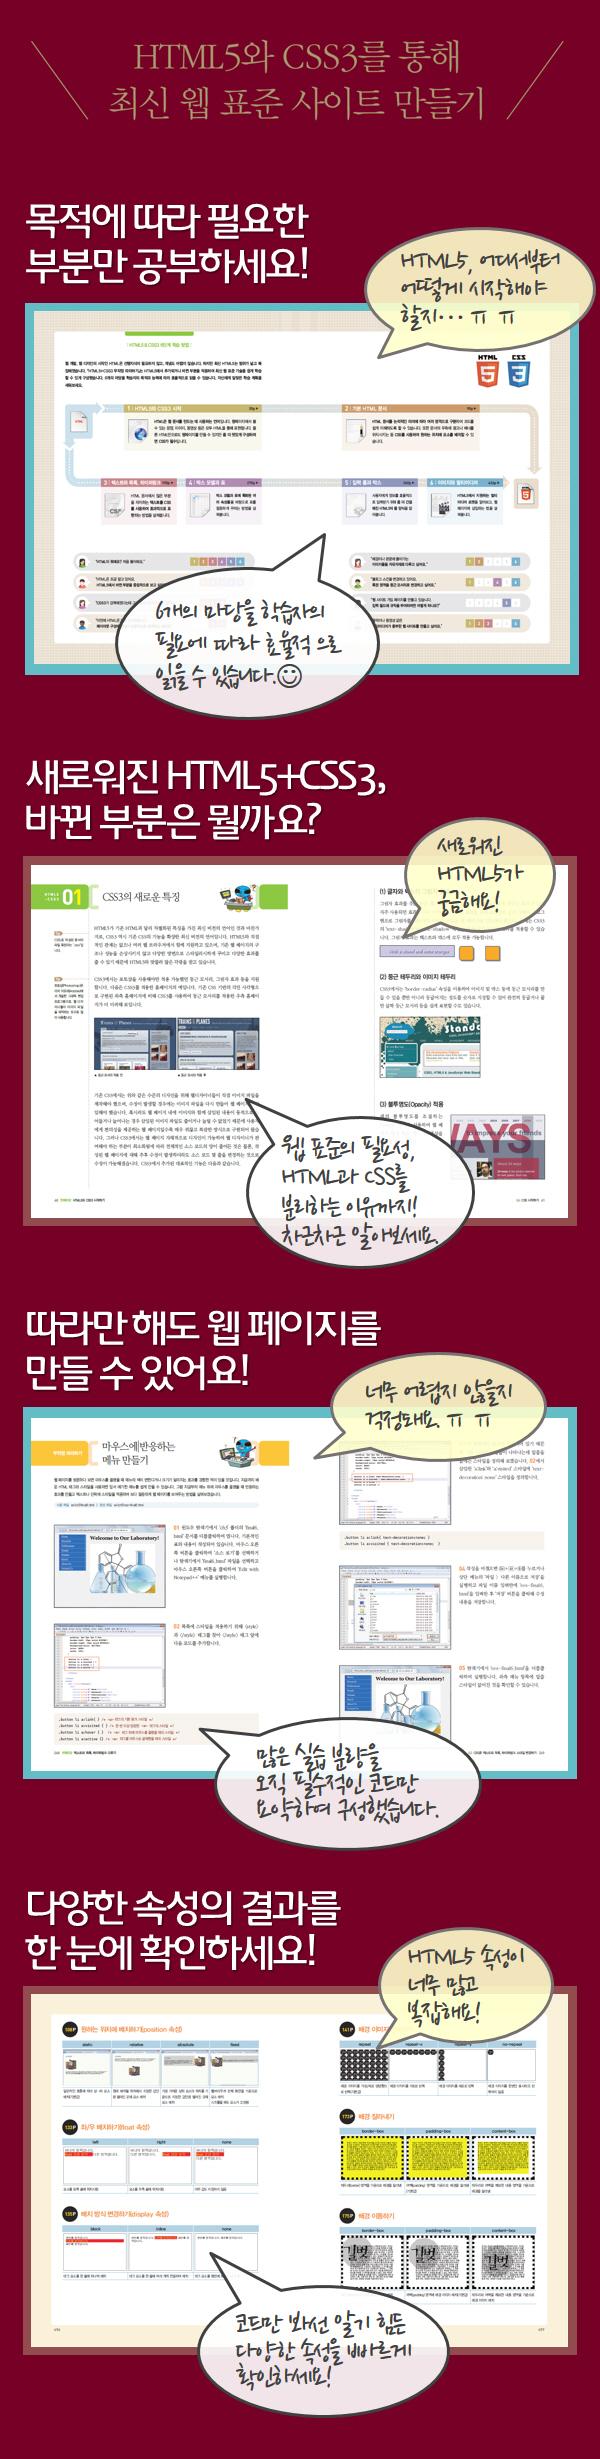 HTML5 CSS3 무작정 따라하기(따라만 해도 완성되는 웹사이트를 위한)(CD1장포함) 도서 상세이미지